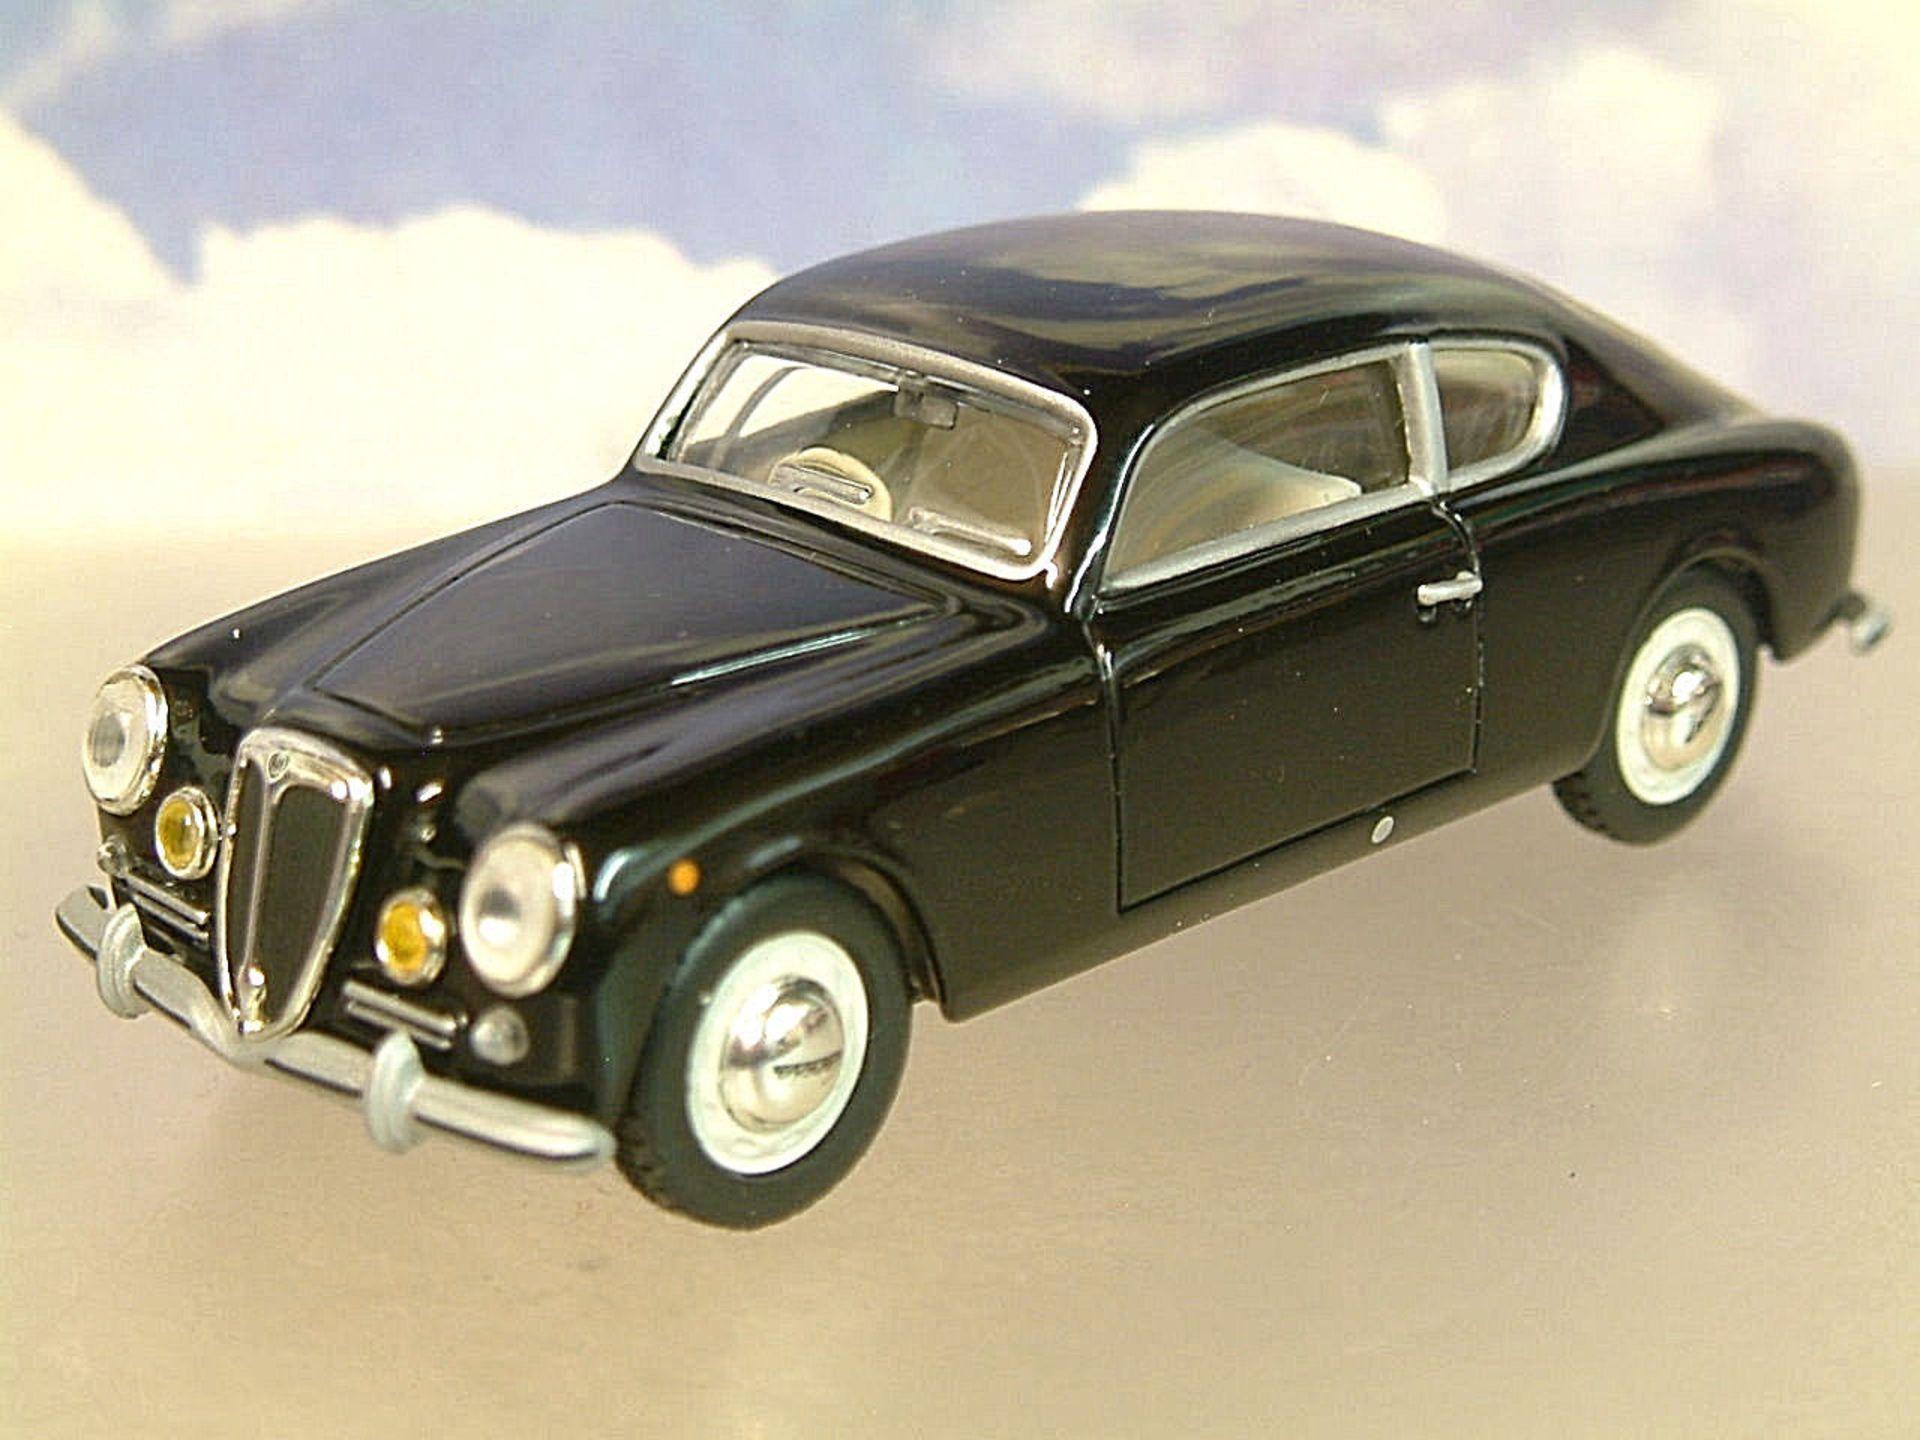 Lot 10360 - V Brand New 1/43 Diecast 1951 Lancia Aurelia Gran Turismo GT B20 - eBay Price £14.95